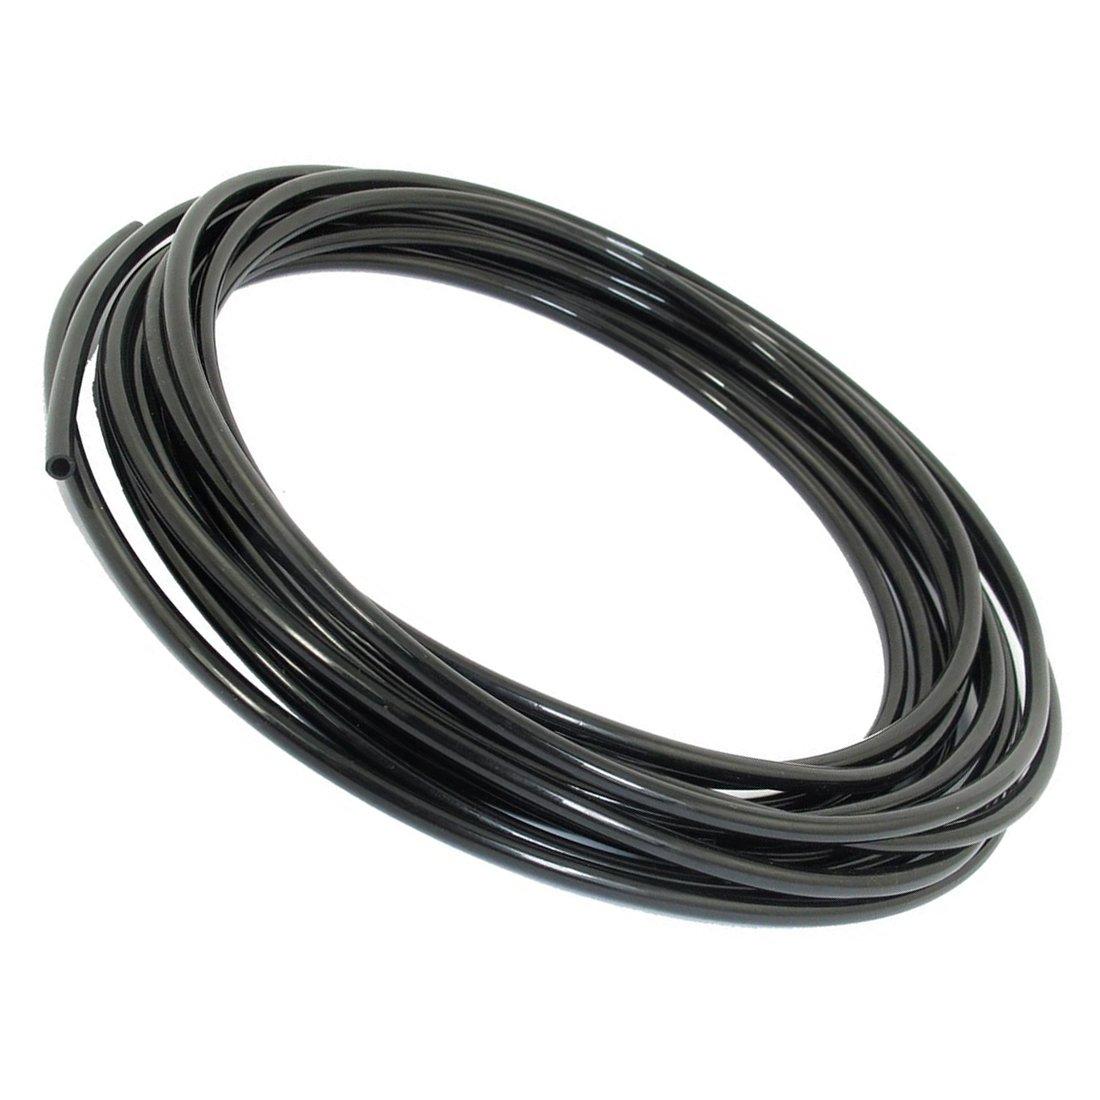 SNOWINSPRING 4mmx2,5mm Flexible schwarz Polyurethan Luft PU pneumatisch Schlauch 5M 16ft